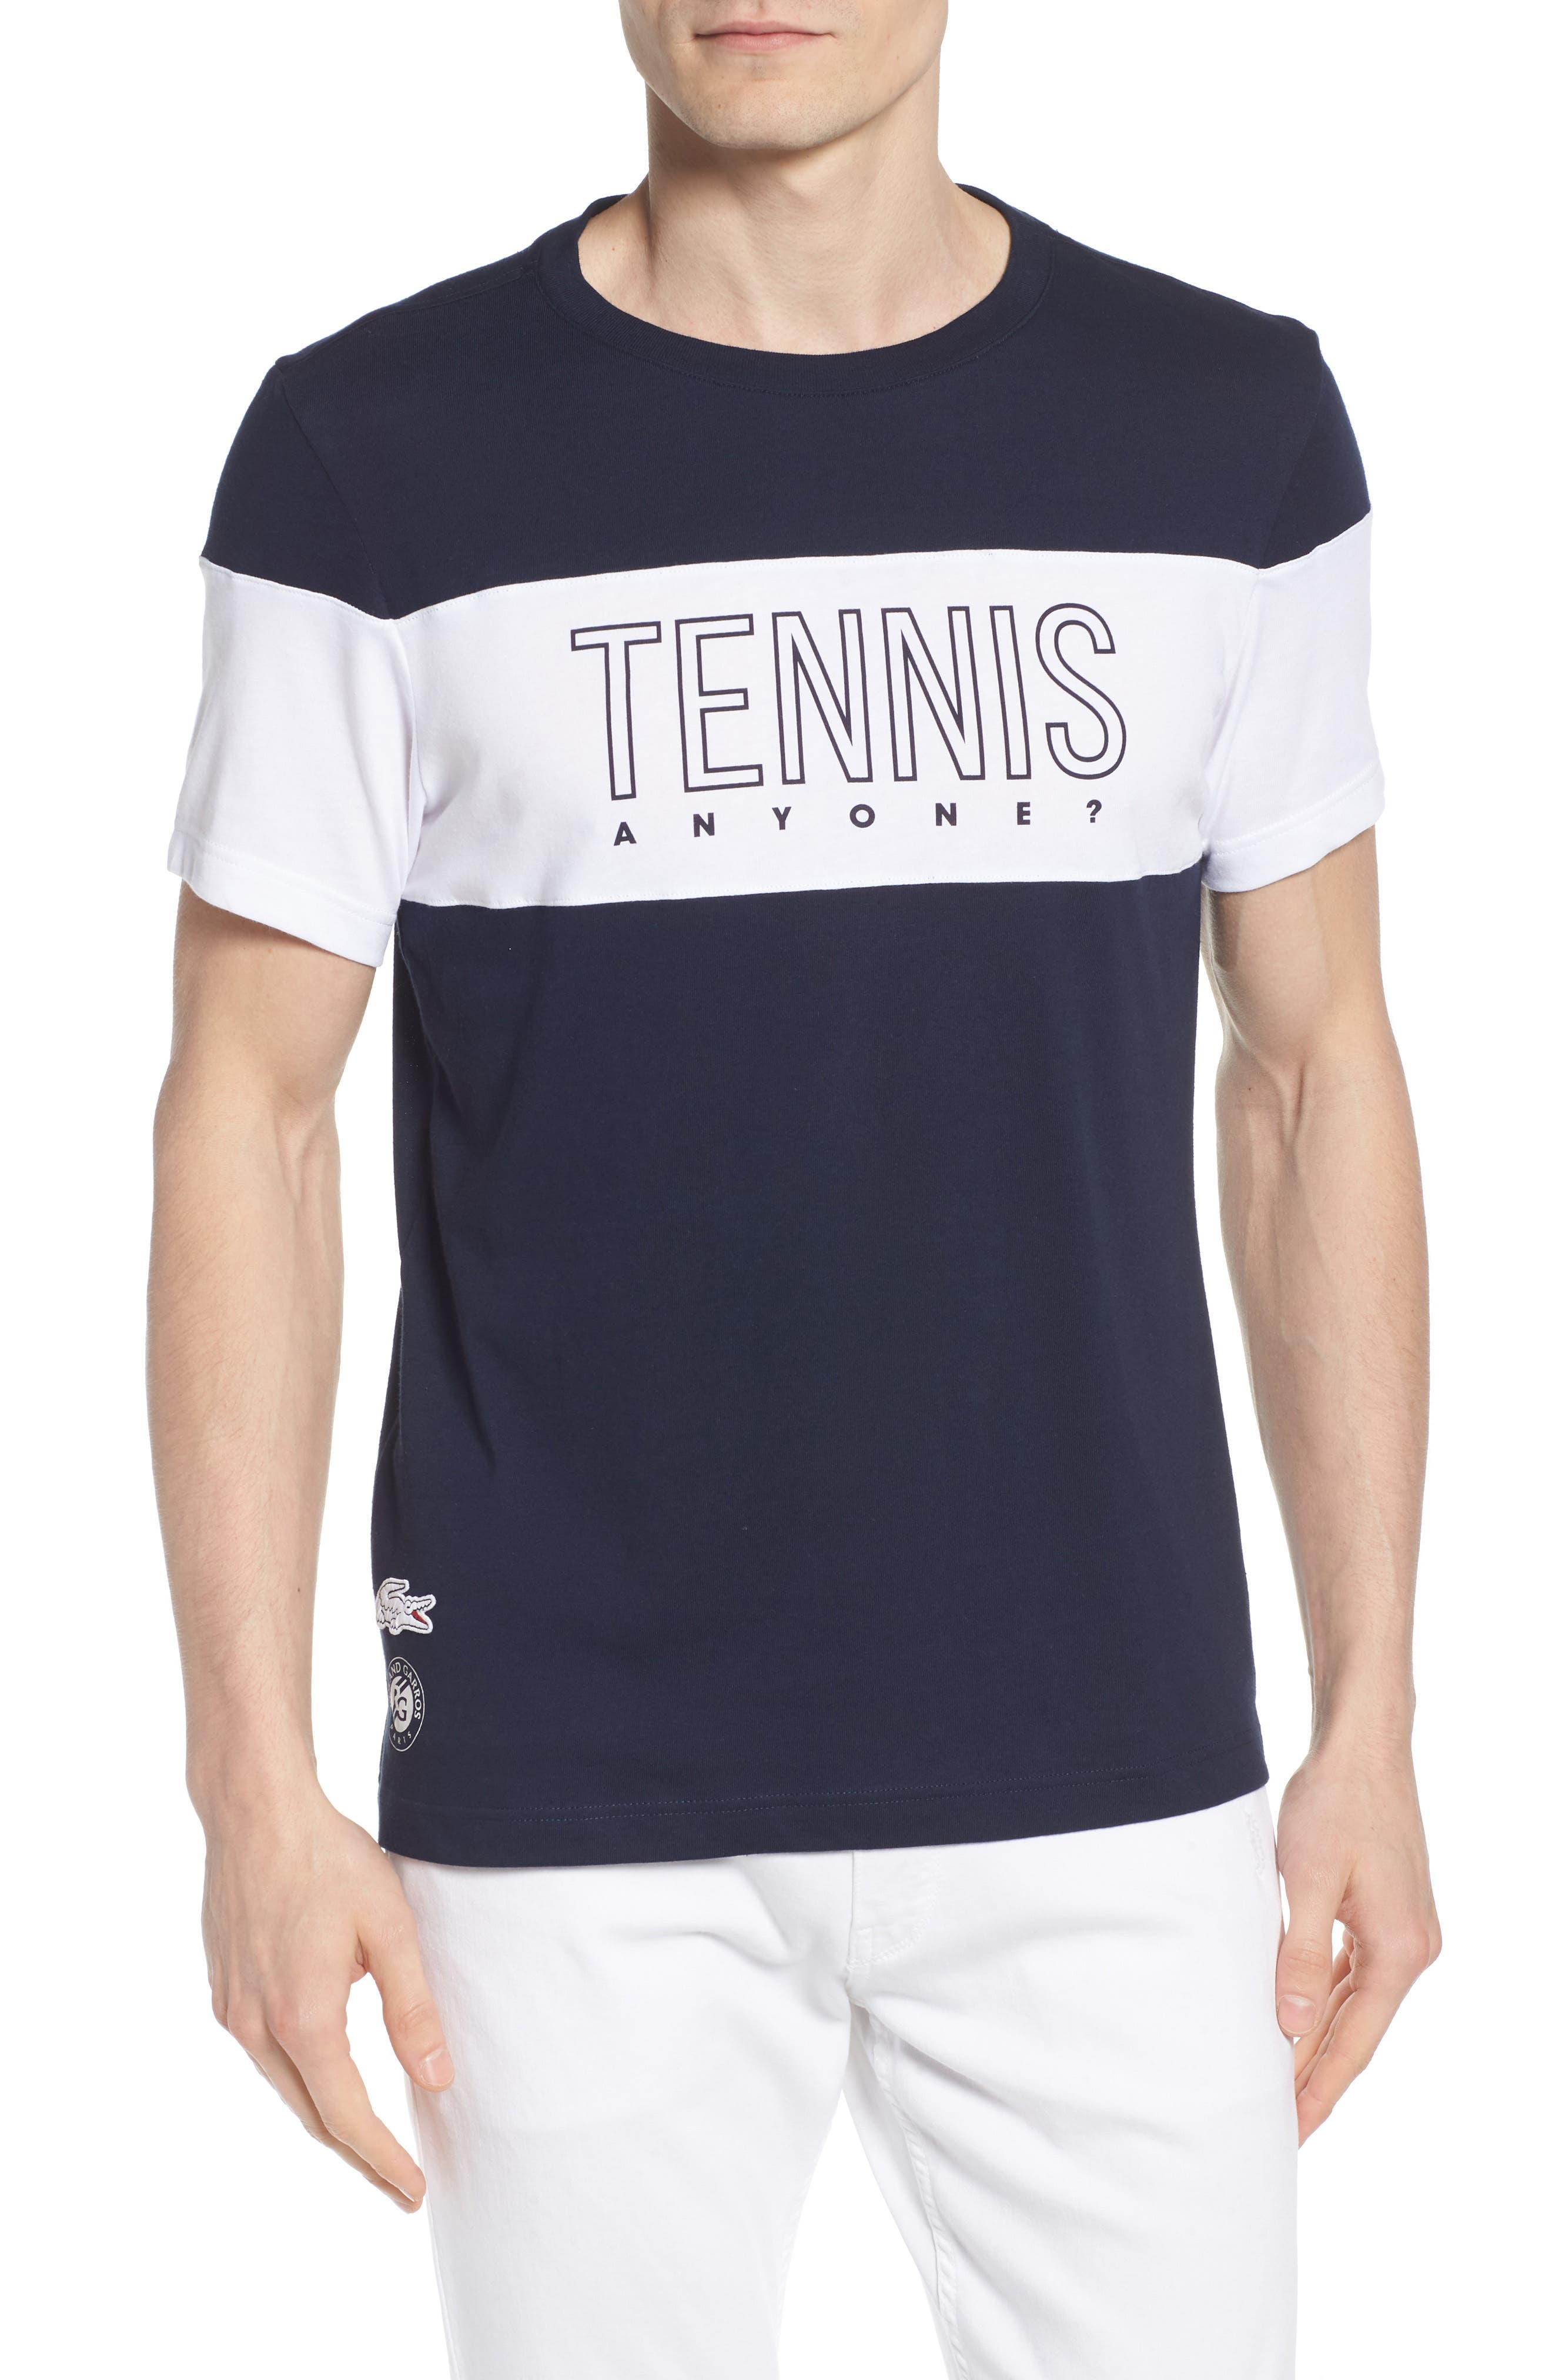 Lacoste Tennis Anyone Tech Jersey T-Shirt